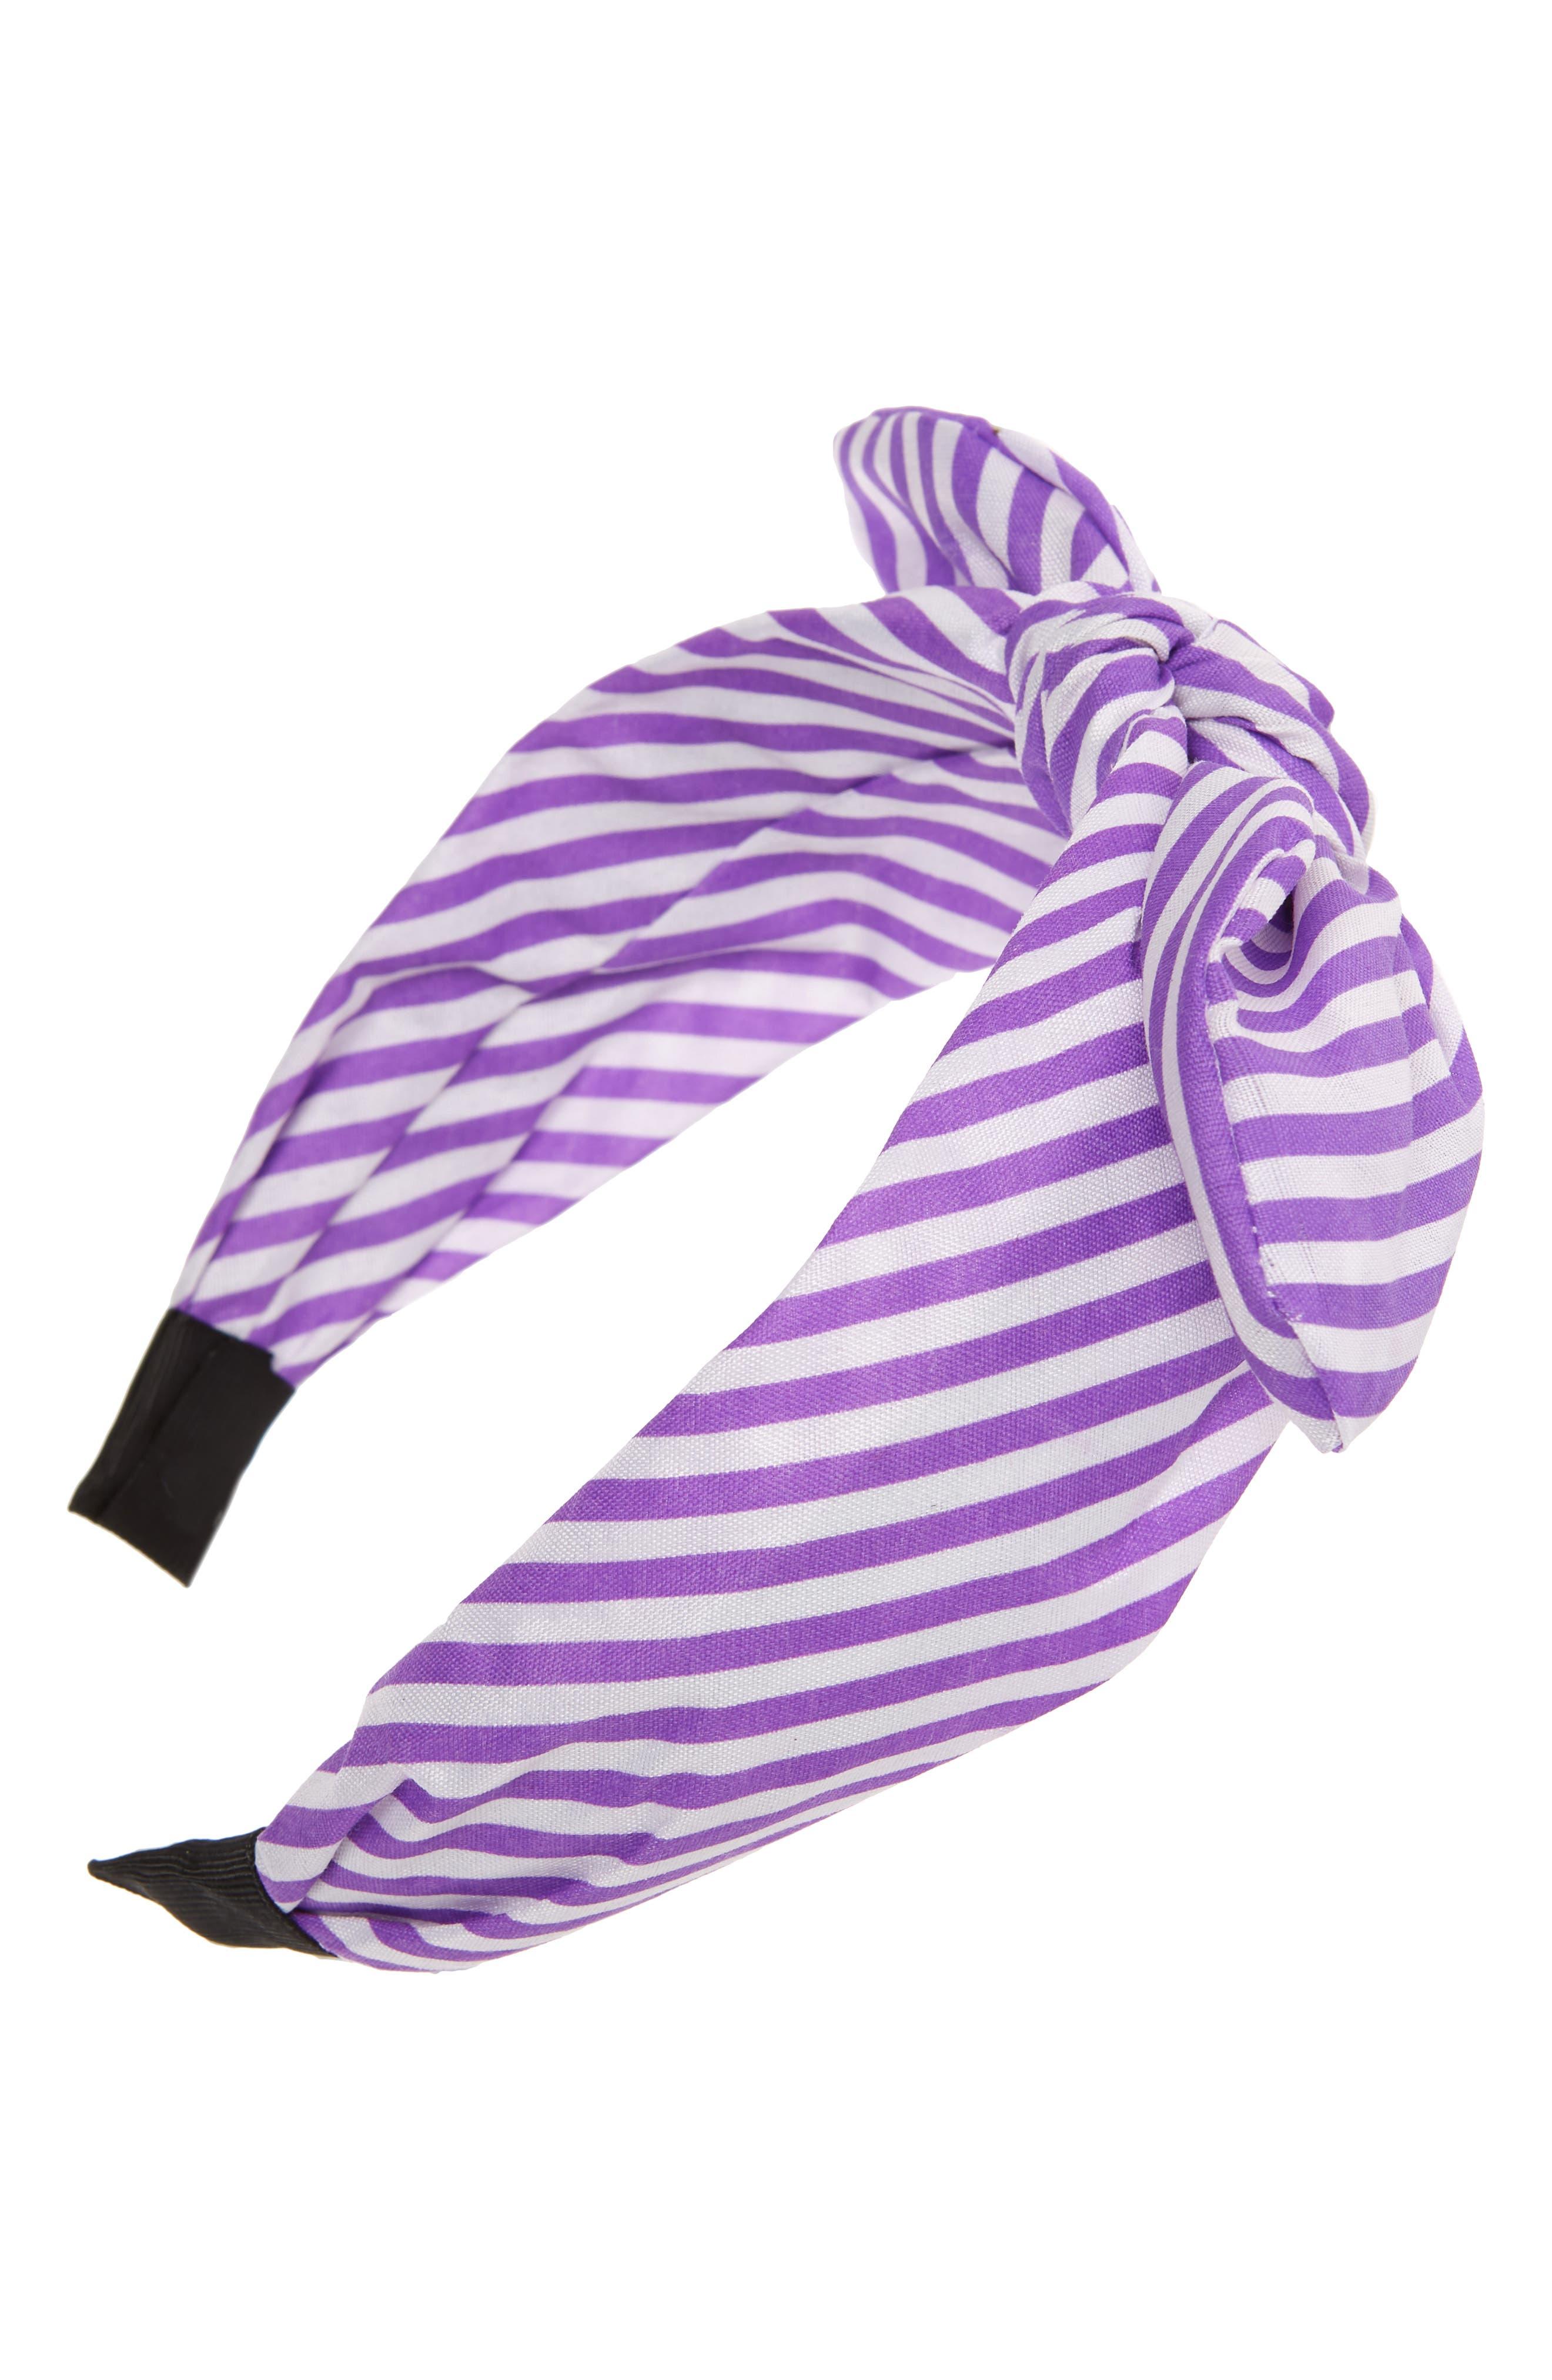 TASHA Knotted Stripe Bow Headband, Main, color, LAVENDER/ WHITE